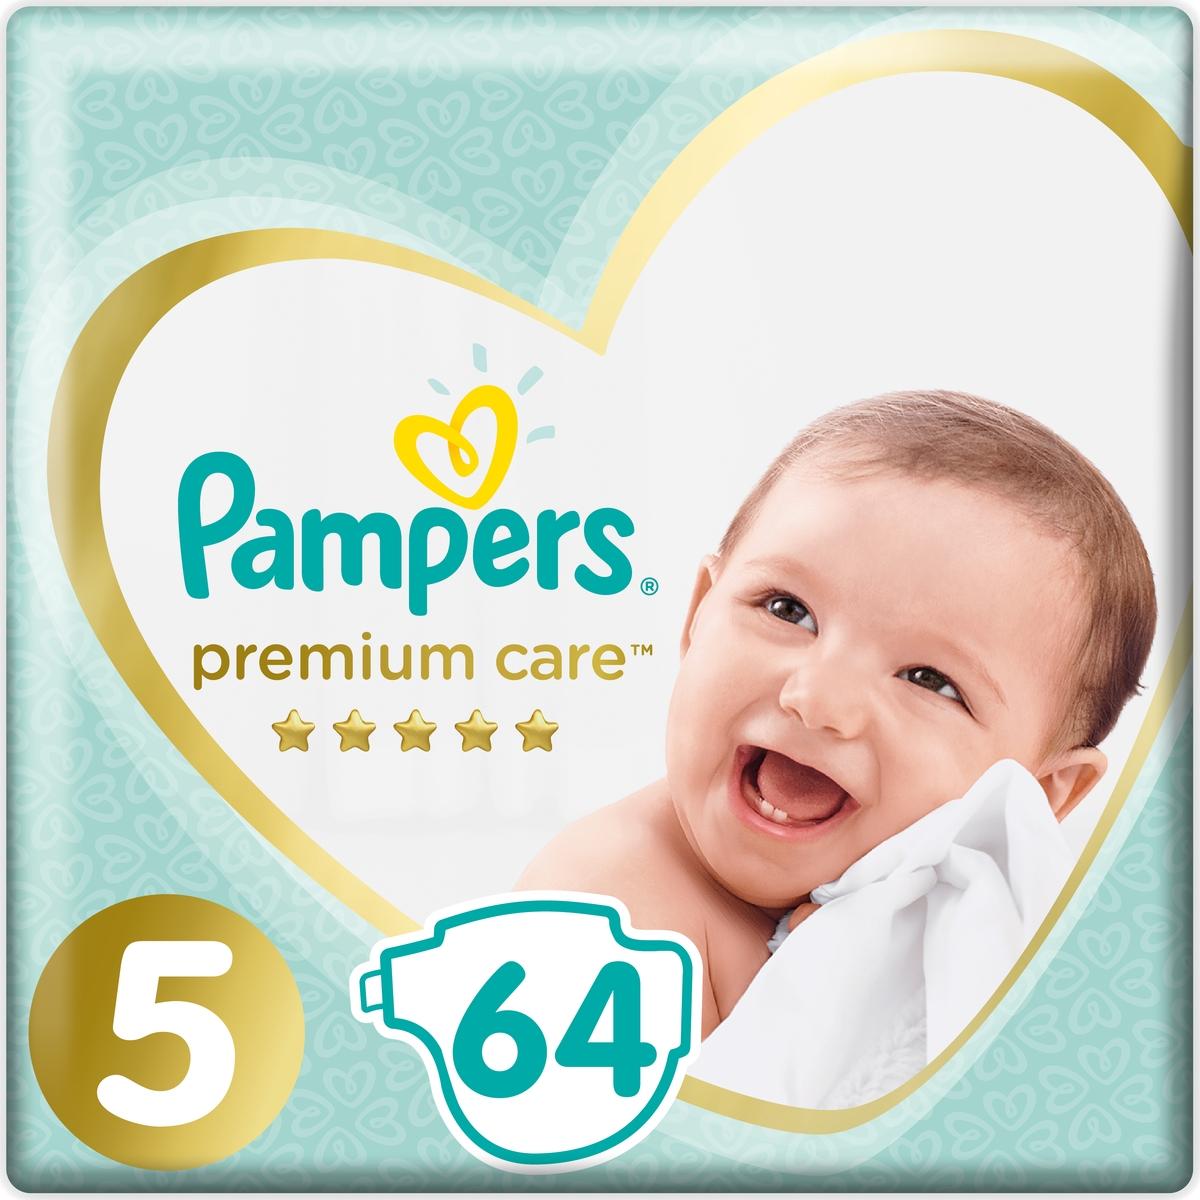 Pampers Подгузники Premium Care 11-16 кг (размер 5) 64 шт подгузники pampers premium care 5 11 кг 64 шт